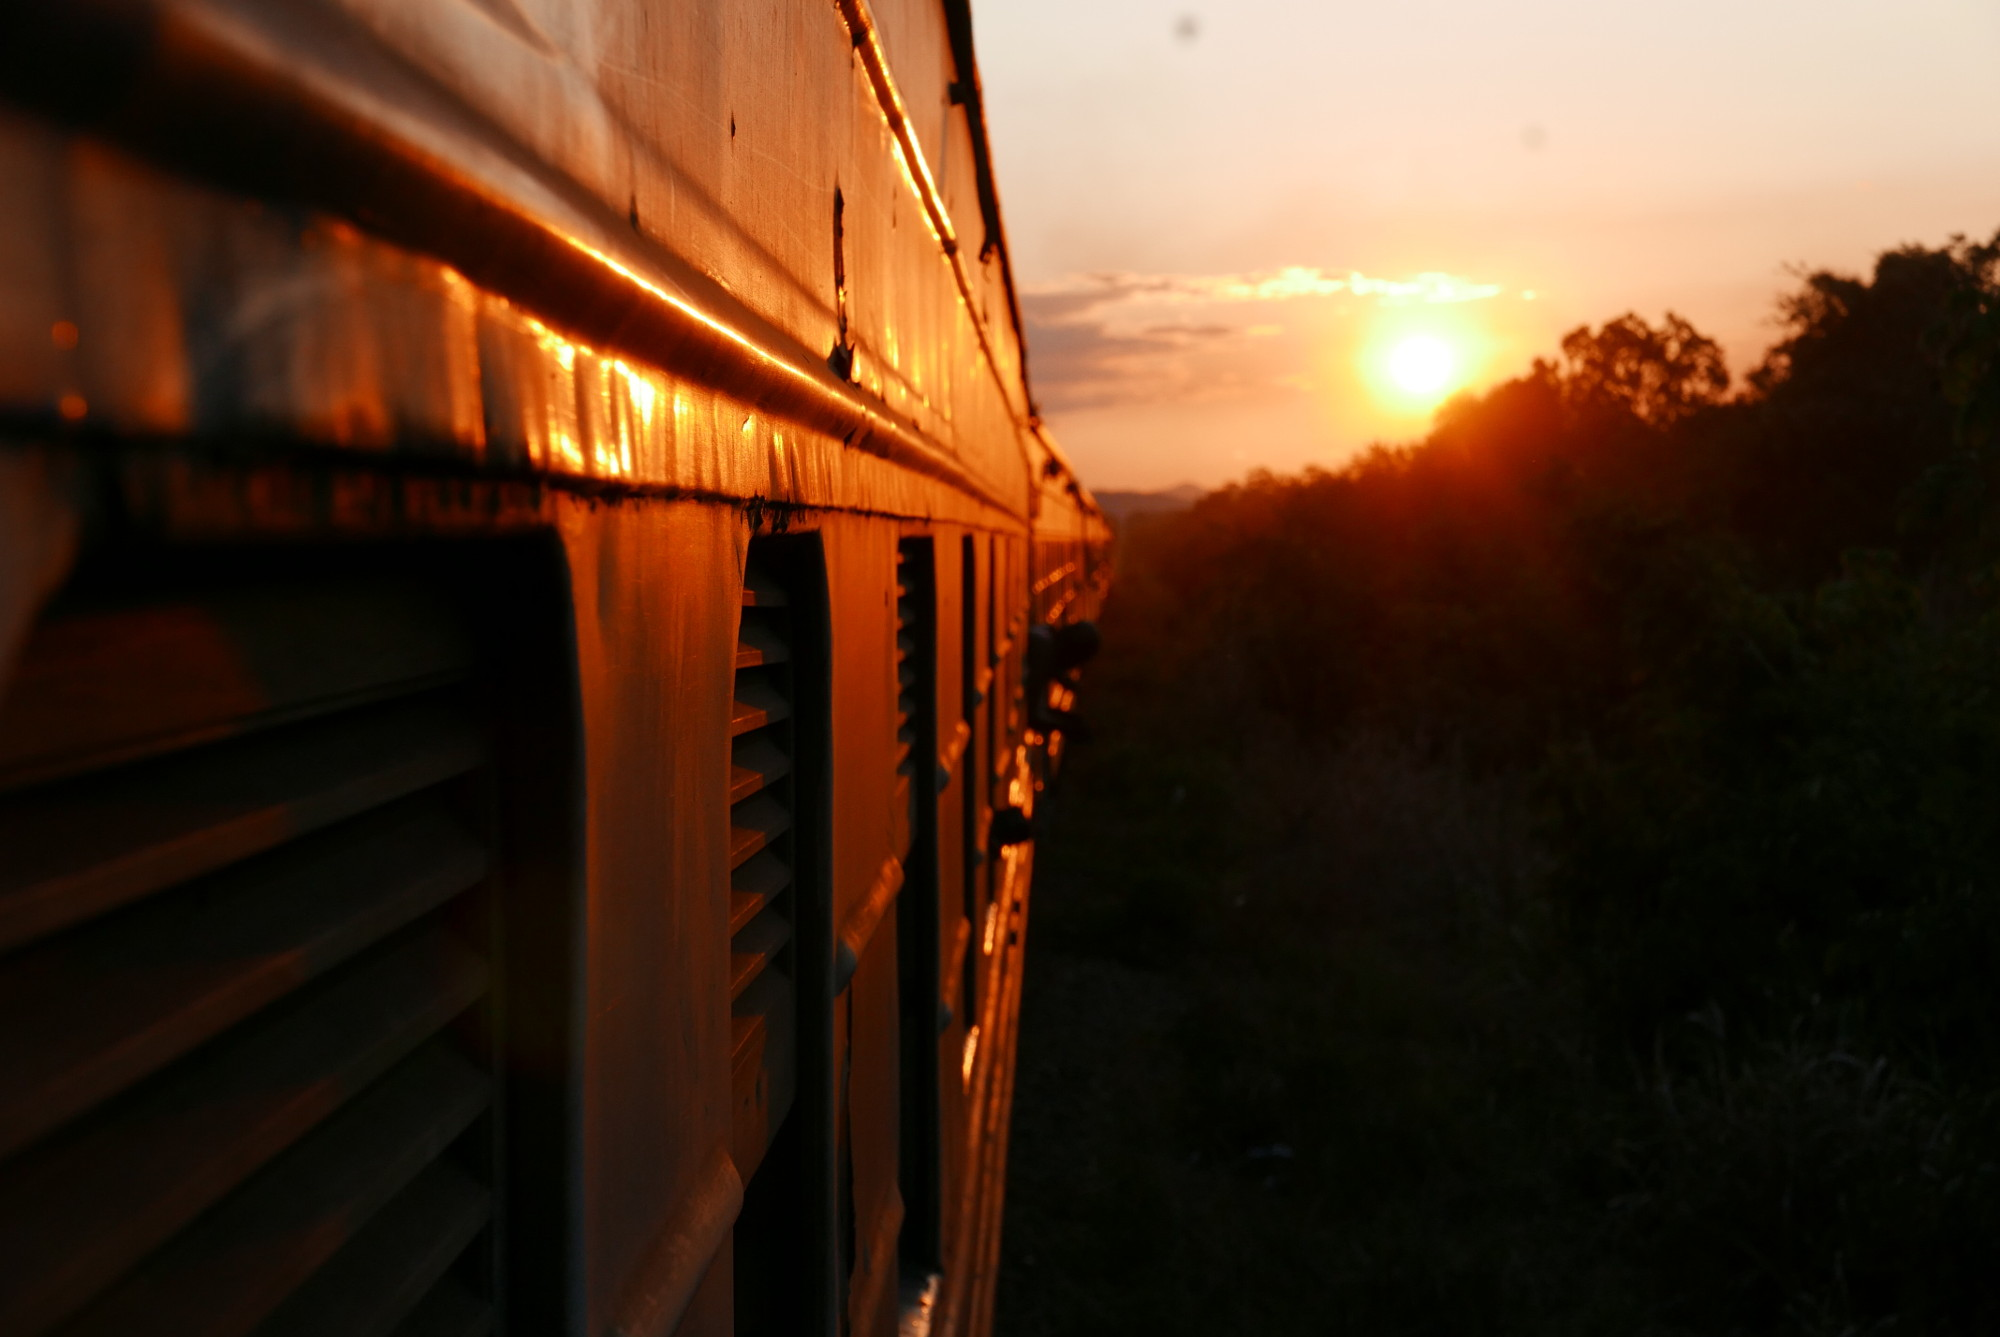 Selous passage, Tazara train